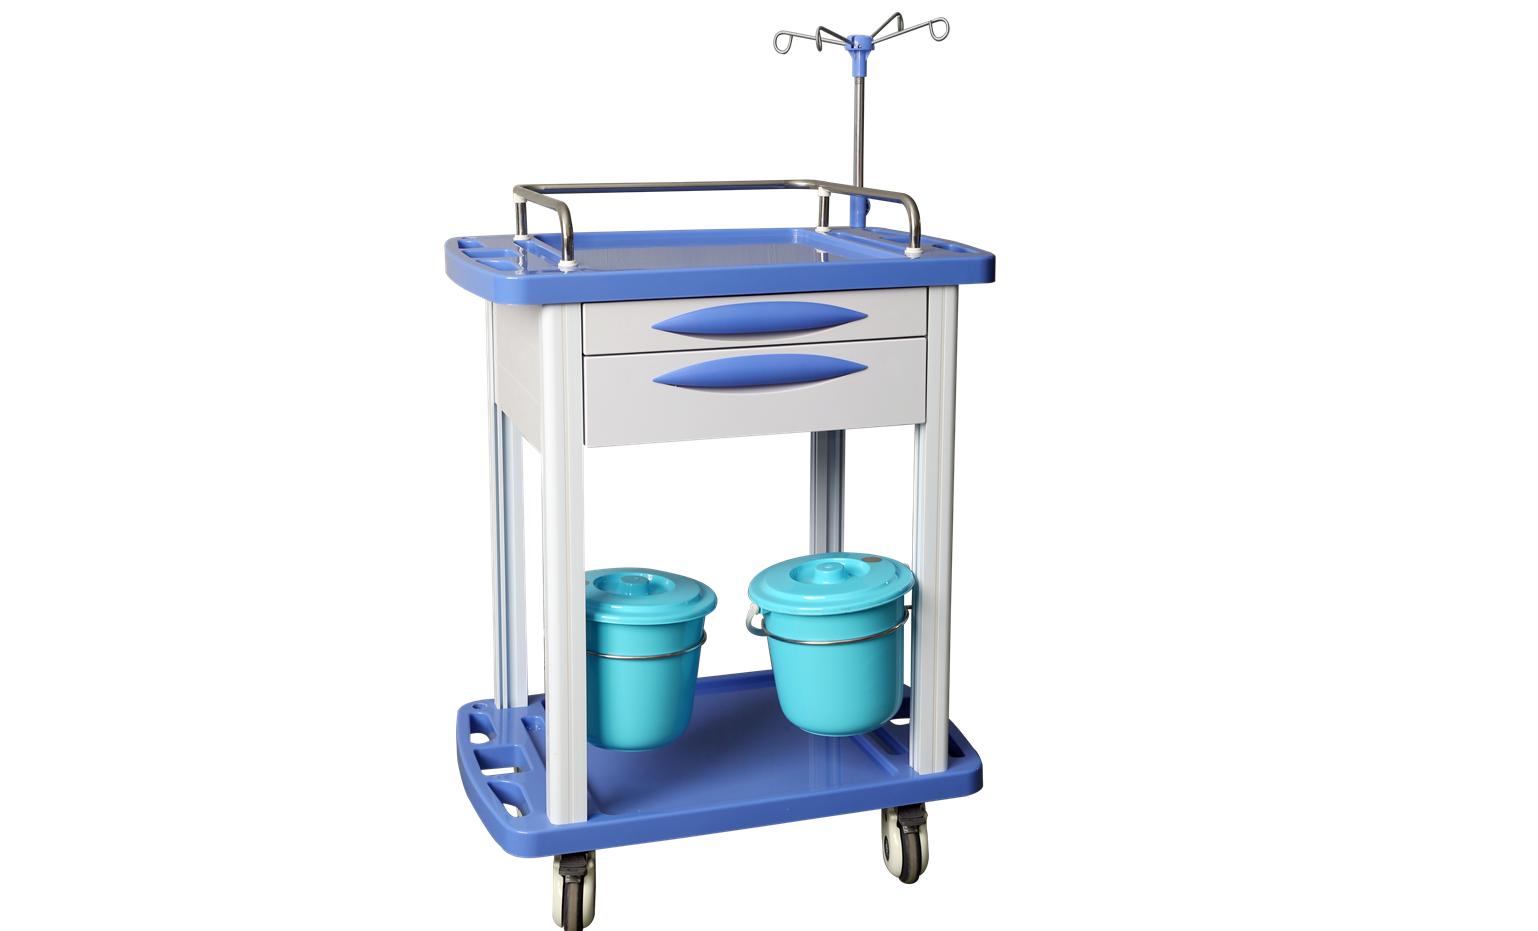 DW-TT007 ABS Treatment trolley